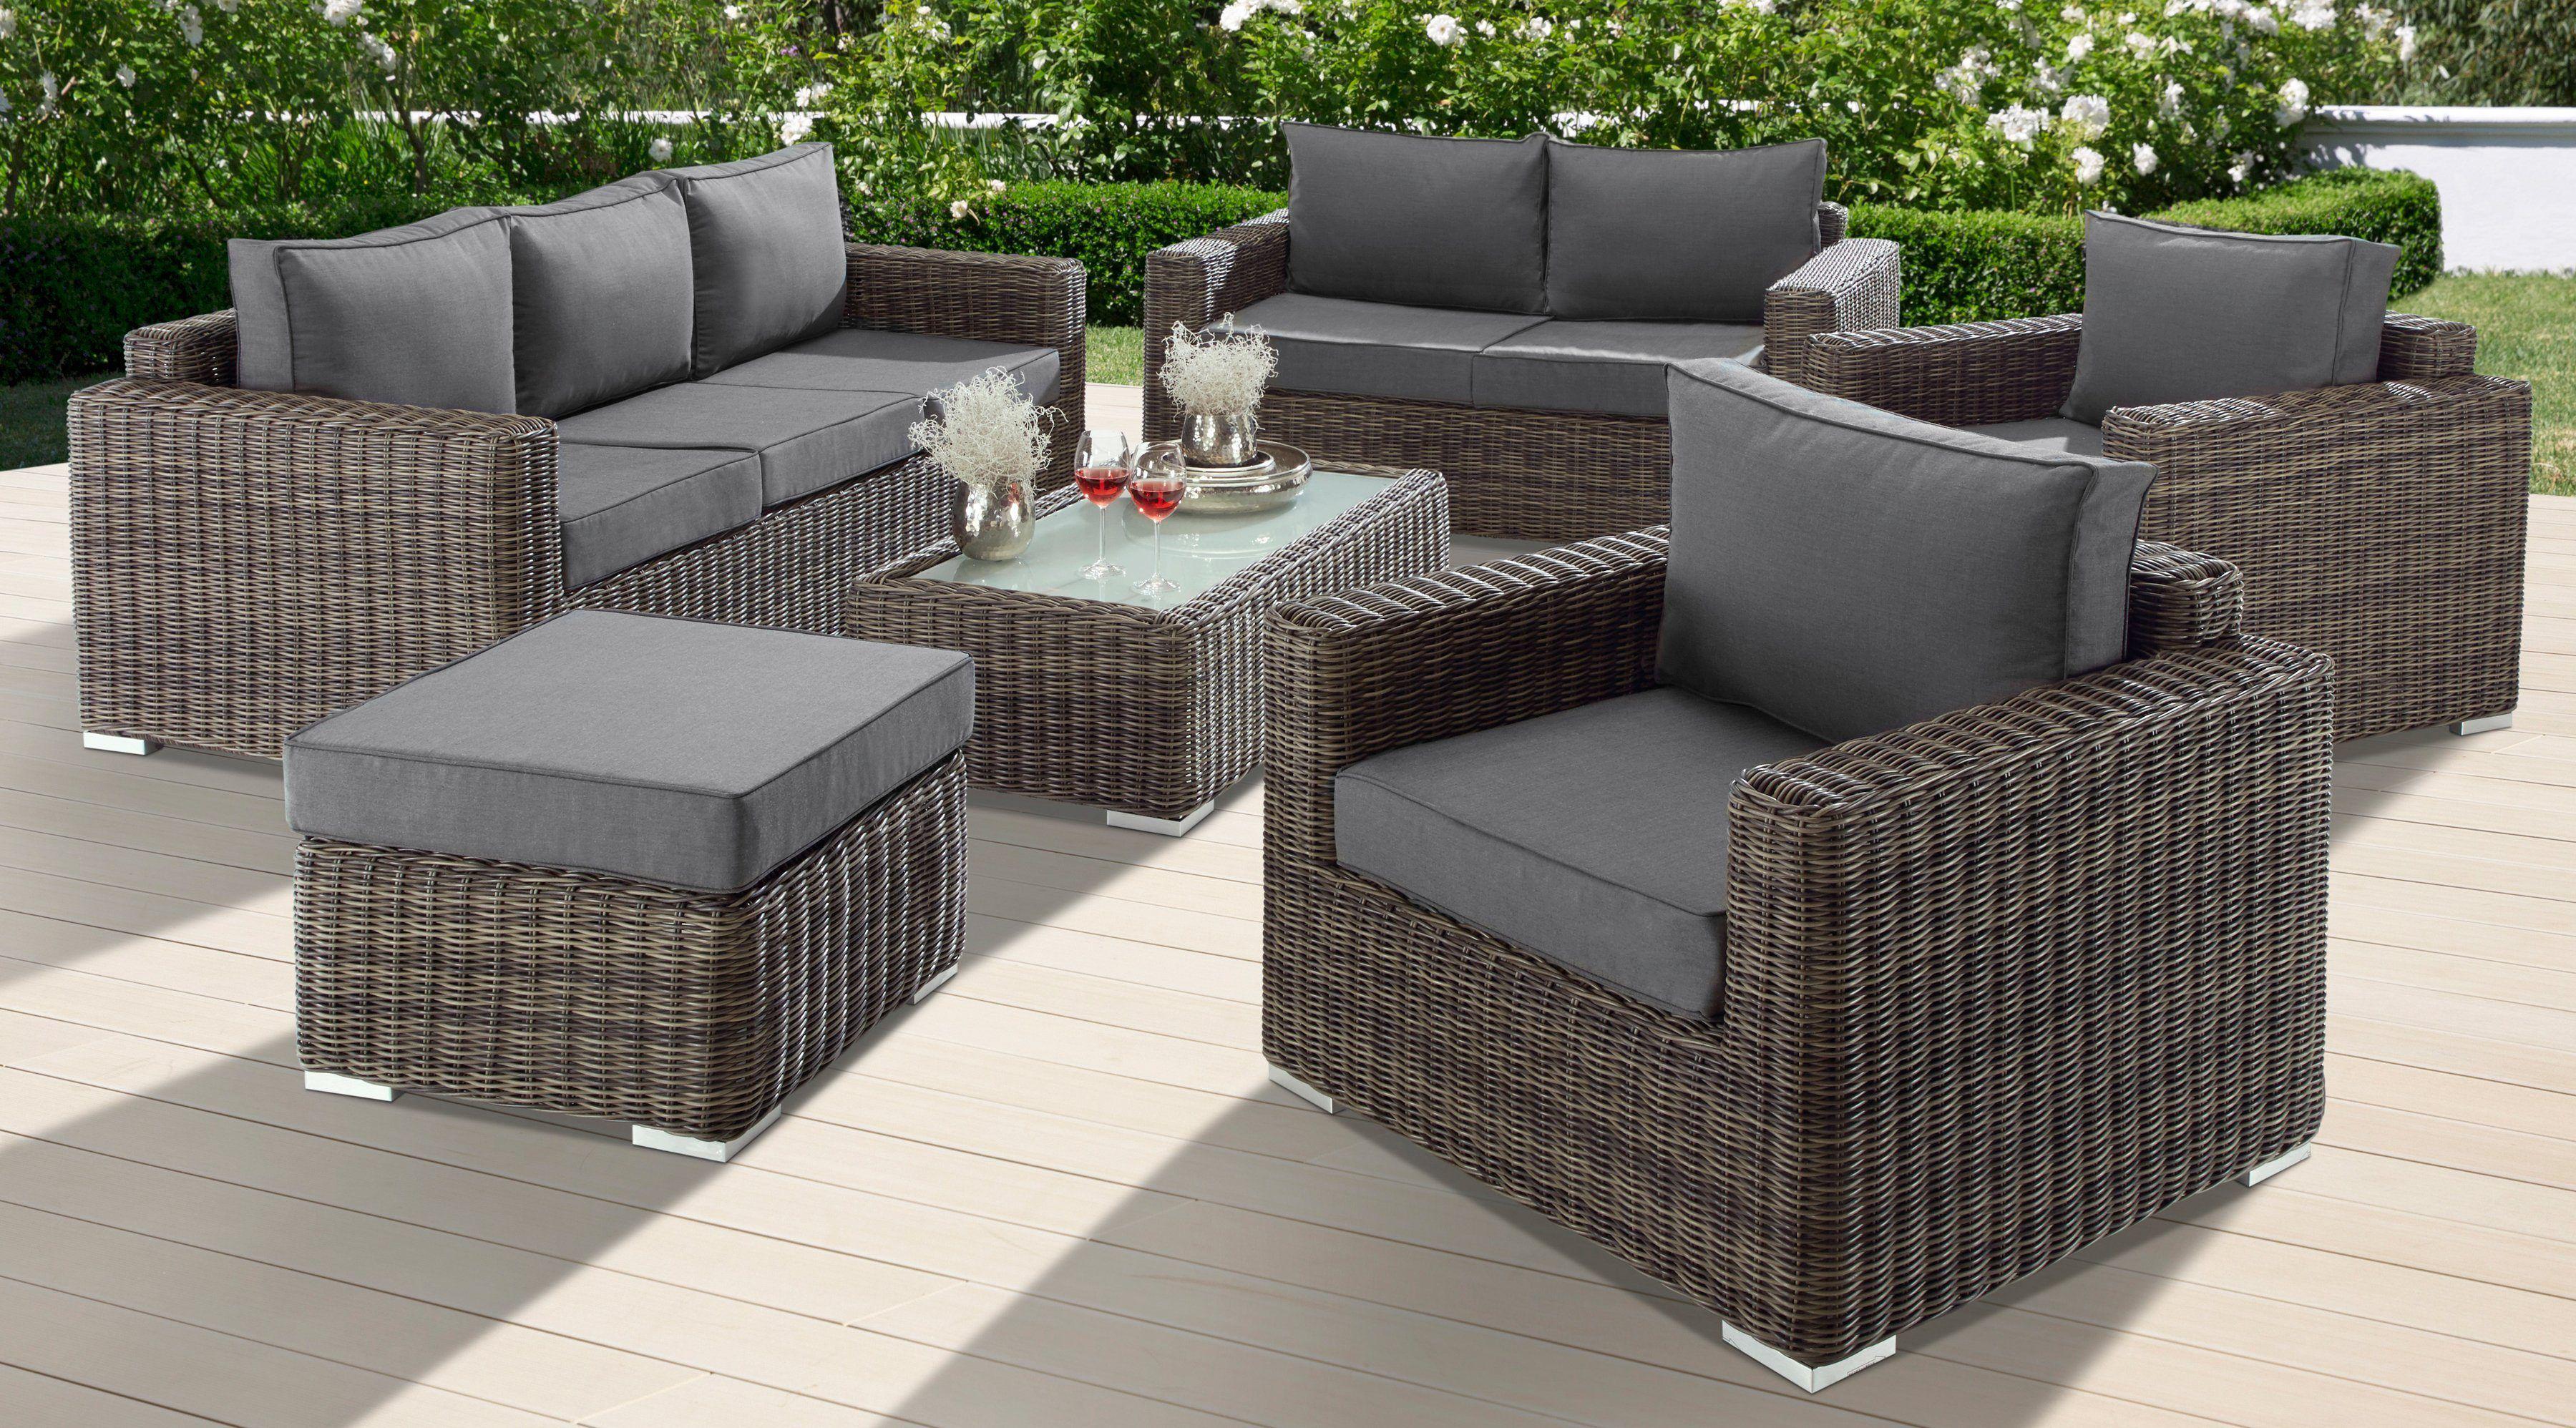 Baidani Loungeset Escape 21 Tlg 3 Sitzer 2 Sitzer Hocker Tisch Polyrattan Lounge Mobel Lounge Rattan Lounge